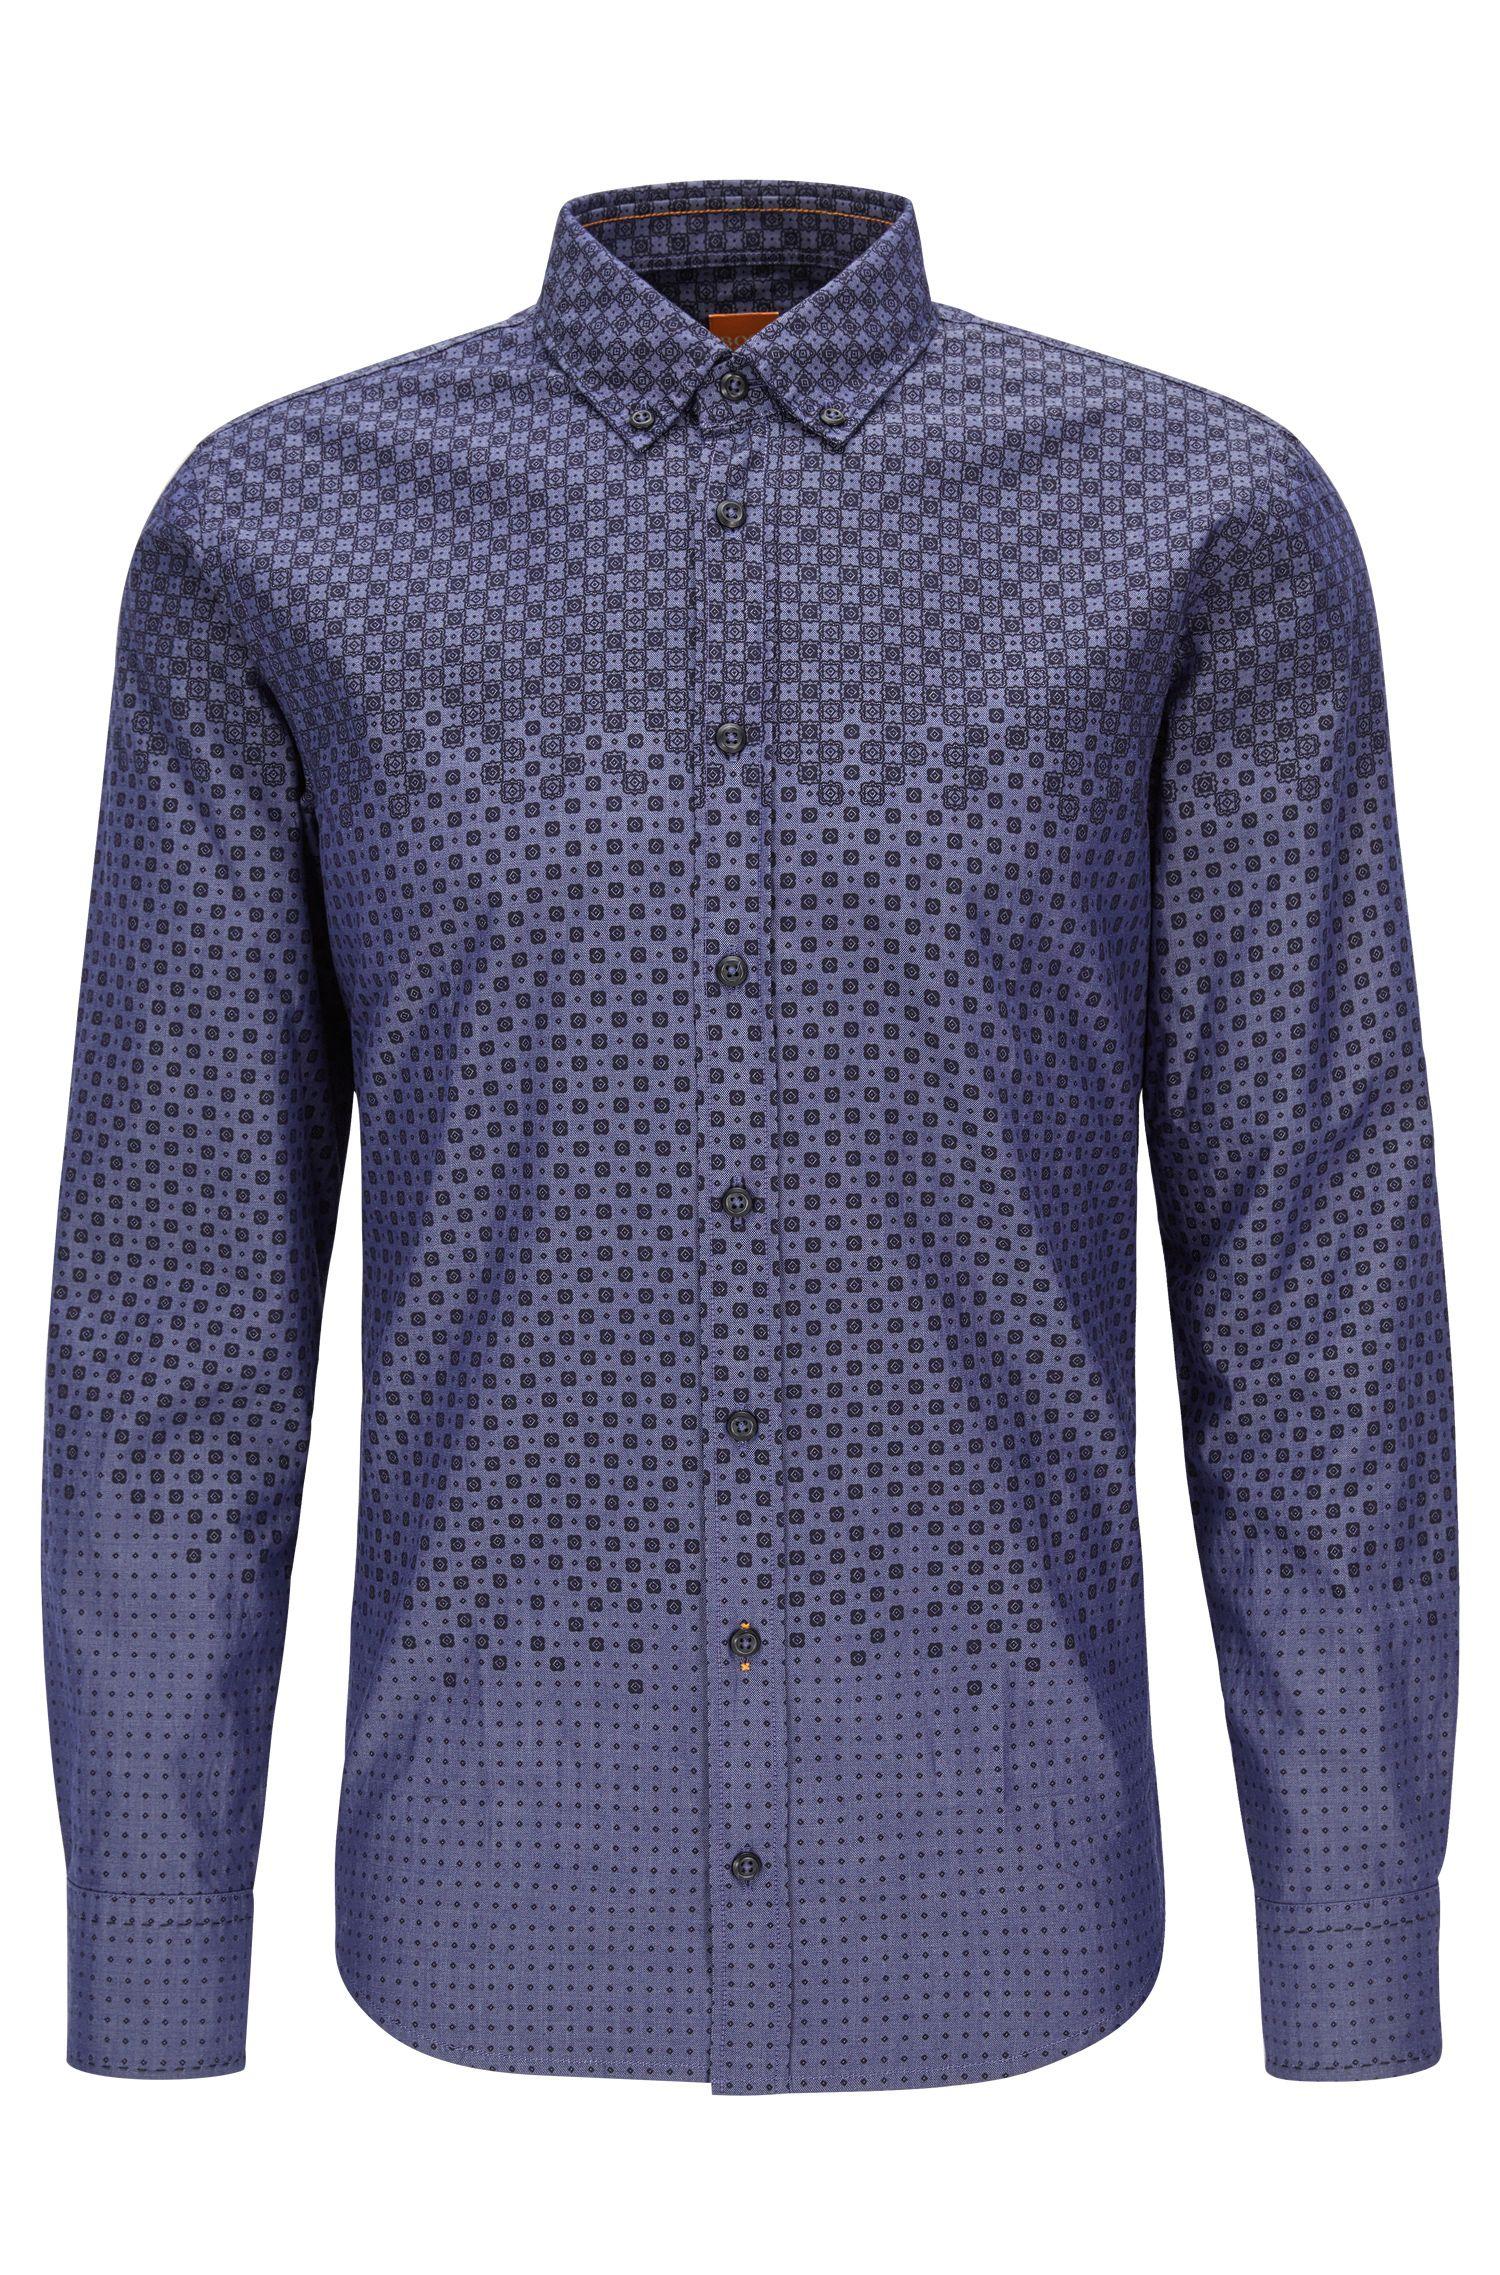 'Epreppy' | Slim Fit, Geometric Cotton Button Down Shirt